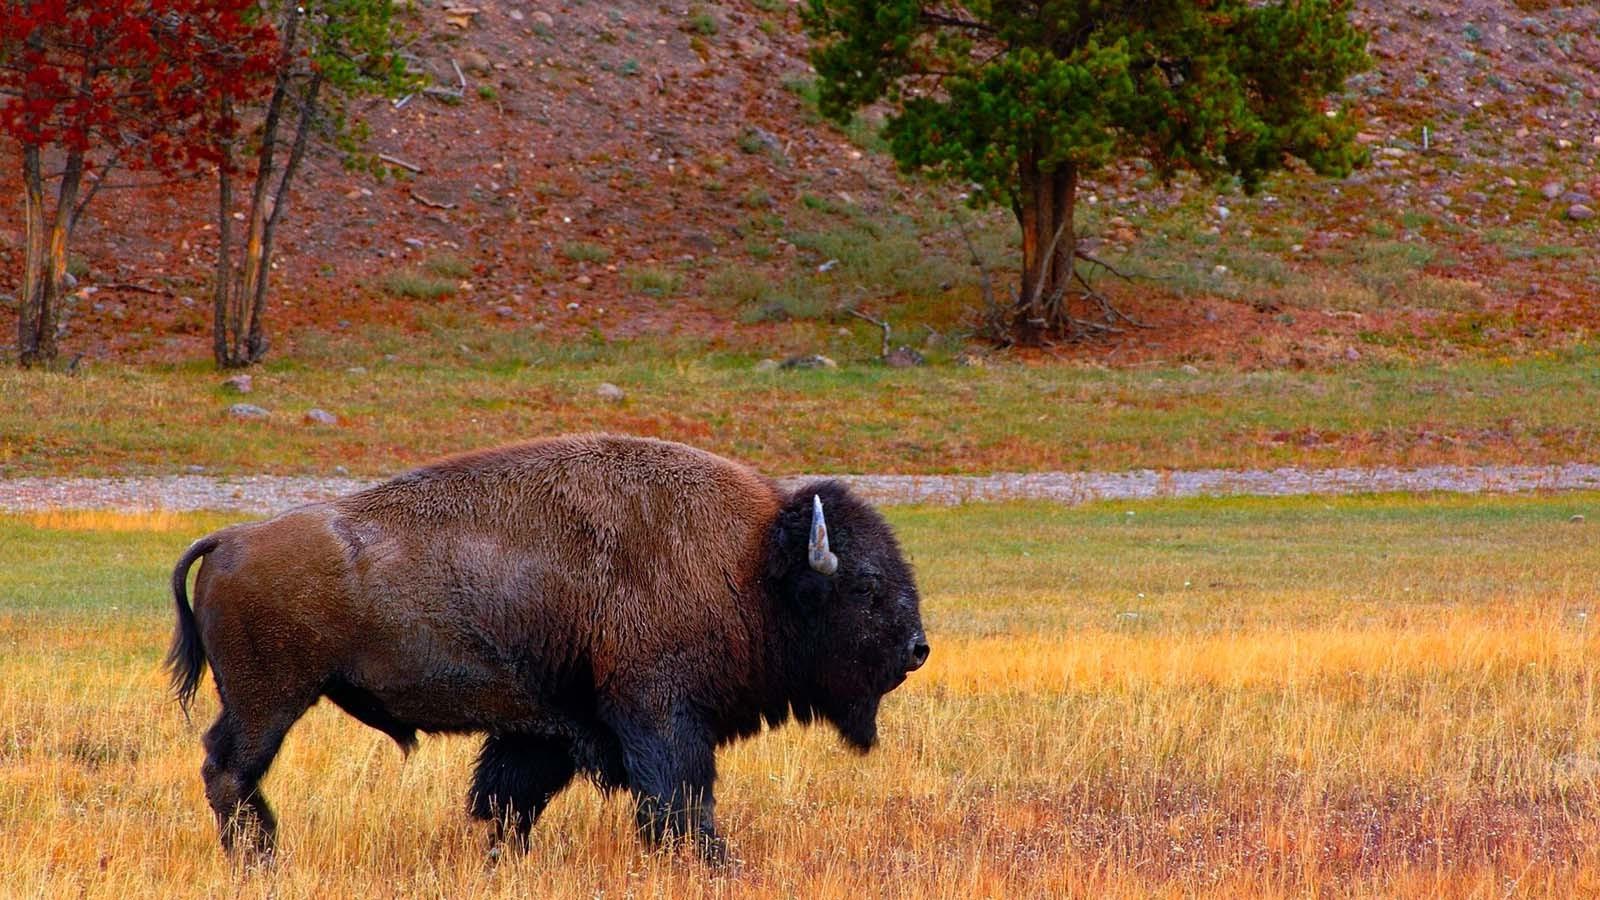 Beautiful Bison Wallpaper - 1600x900-px-animals-bison-buffalo-751459  Image_932135.jpg